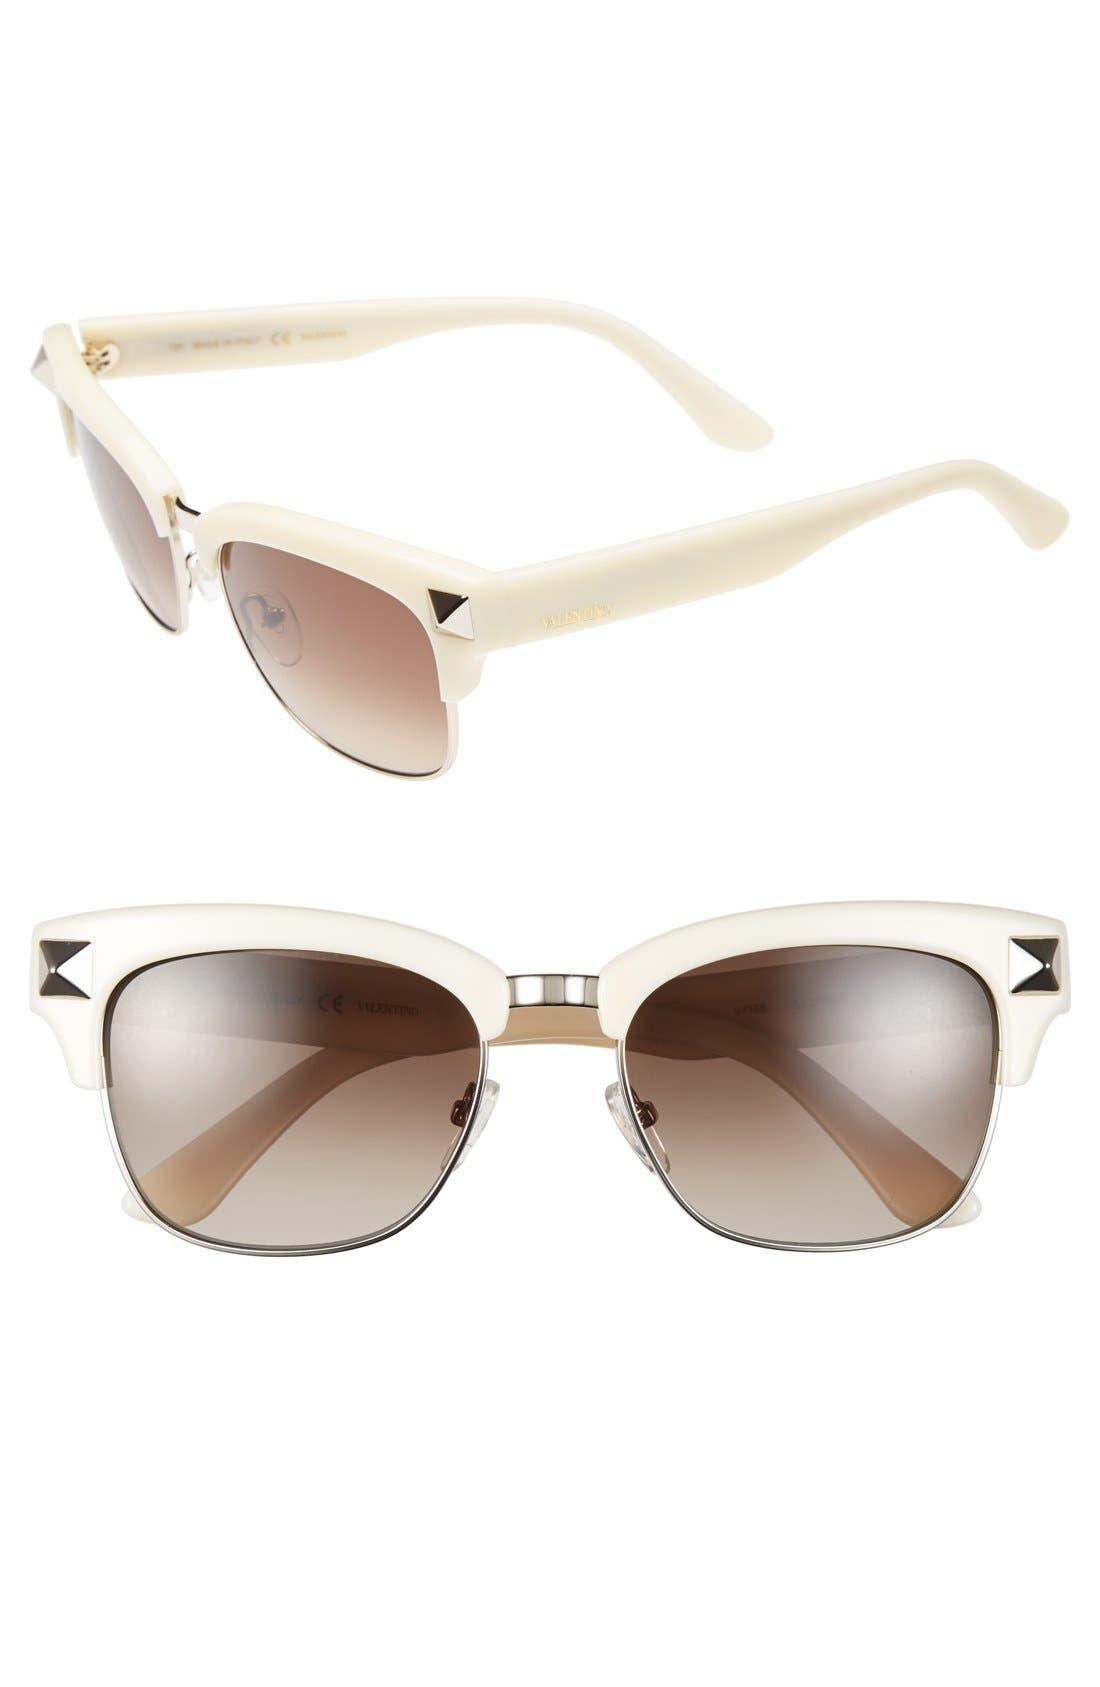 Main Image - Valentino 'Rockstud' 53mm Sunglasses